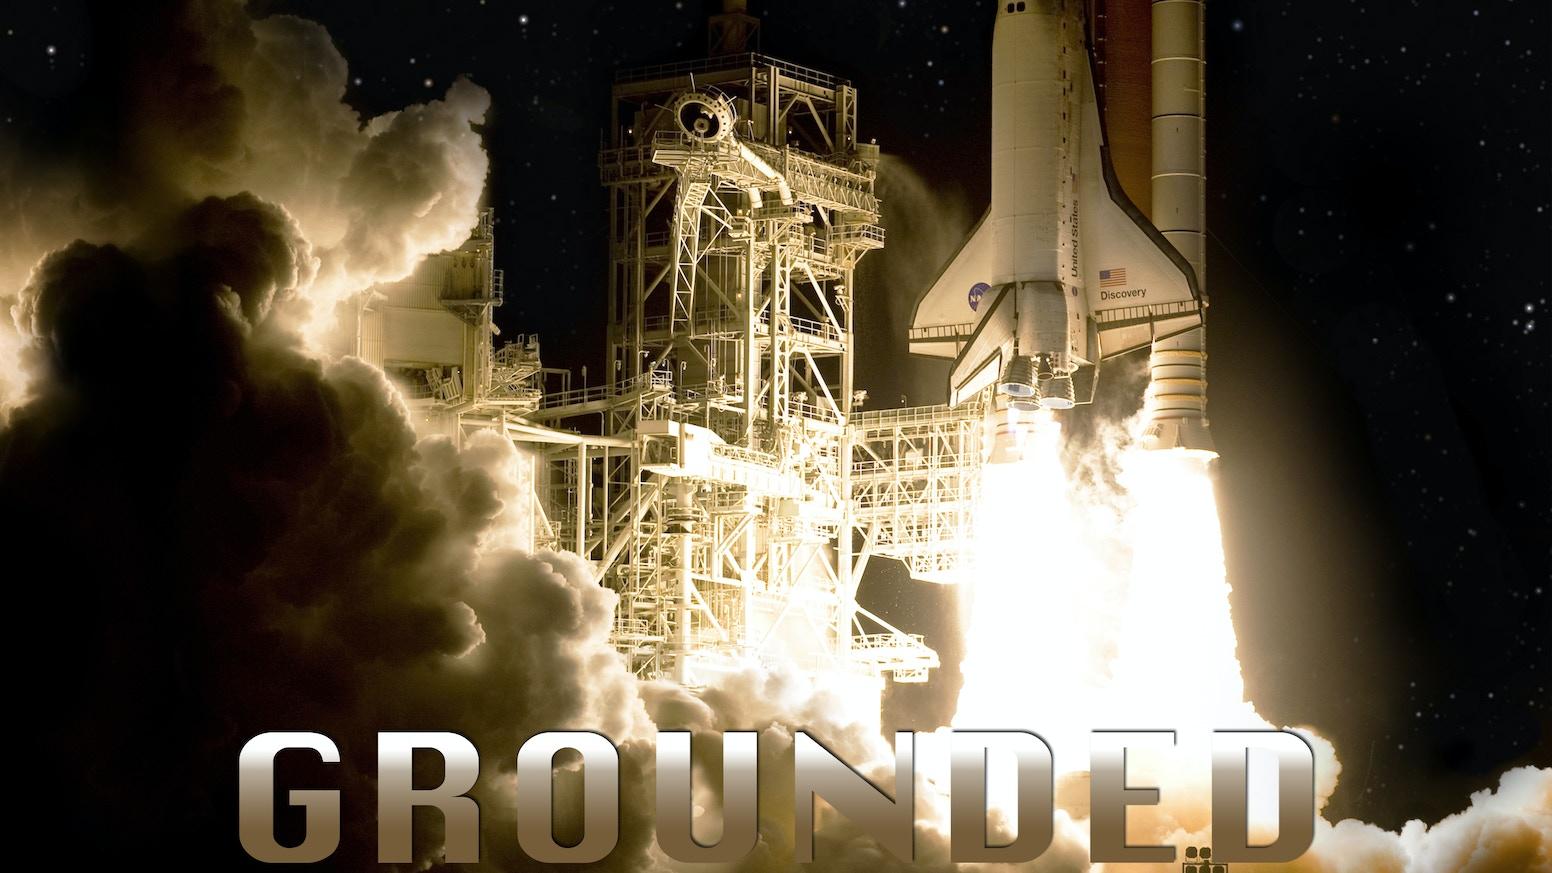 end of nasa space shuttle program - photo #36